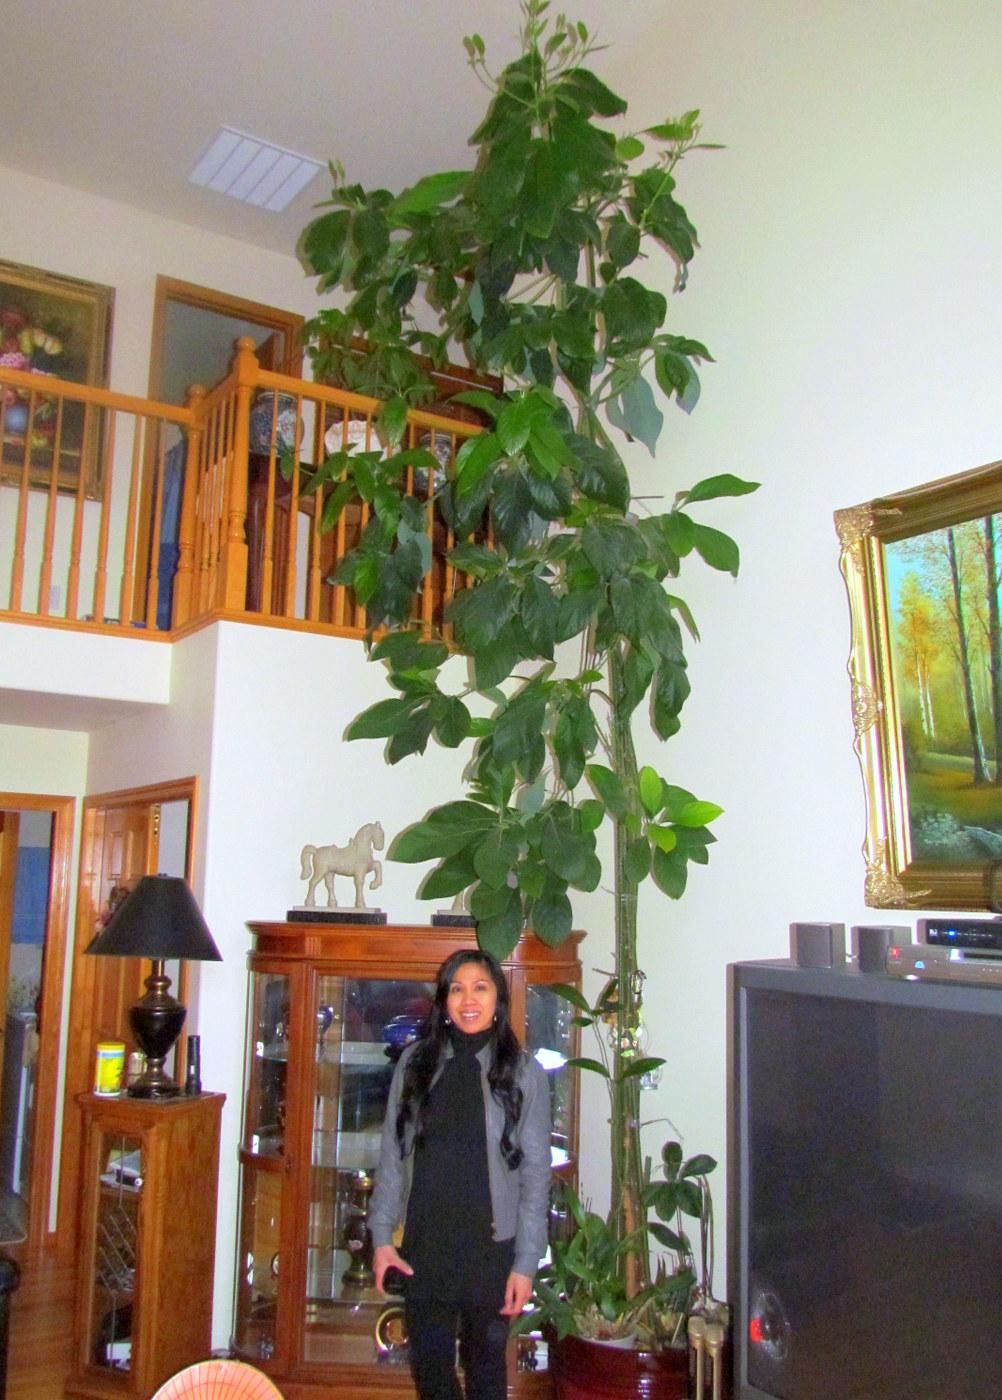 Giant indoor plants avocado tree and bird of paradise